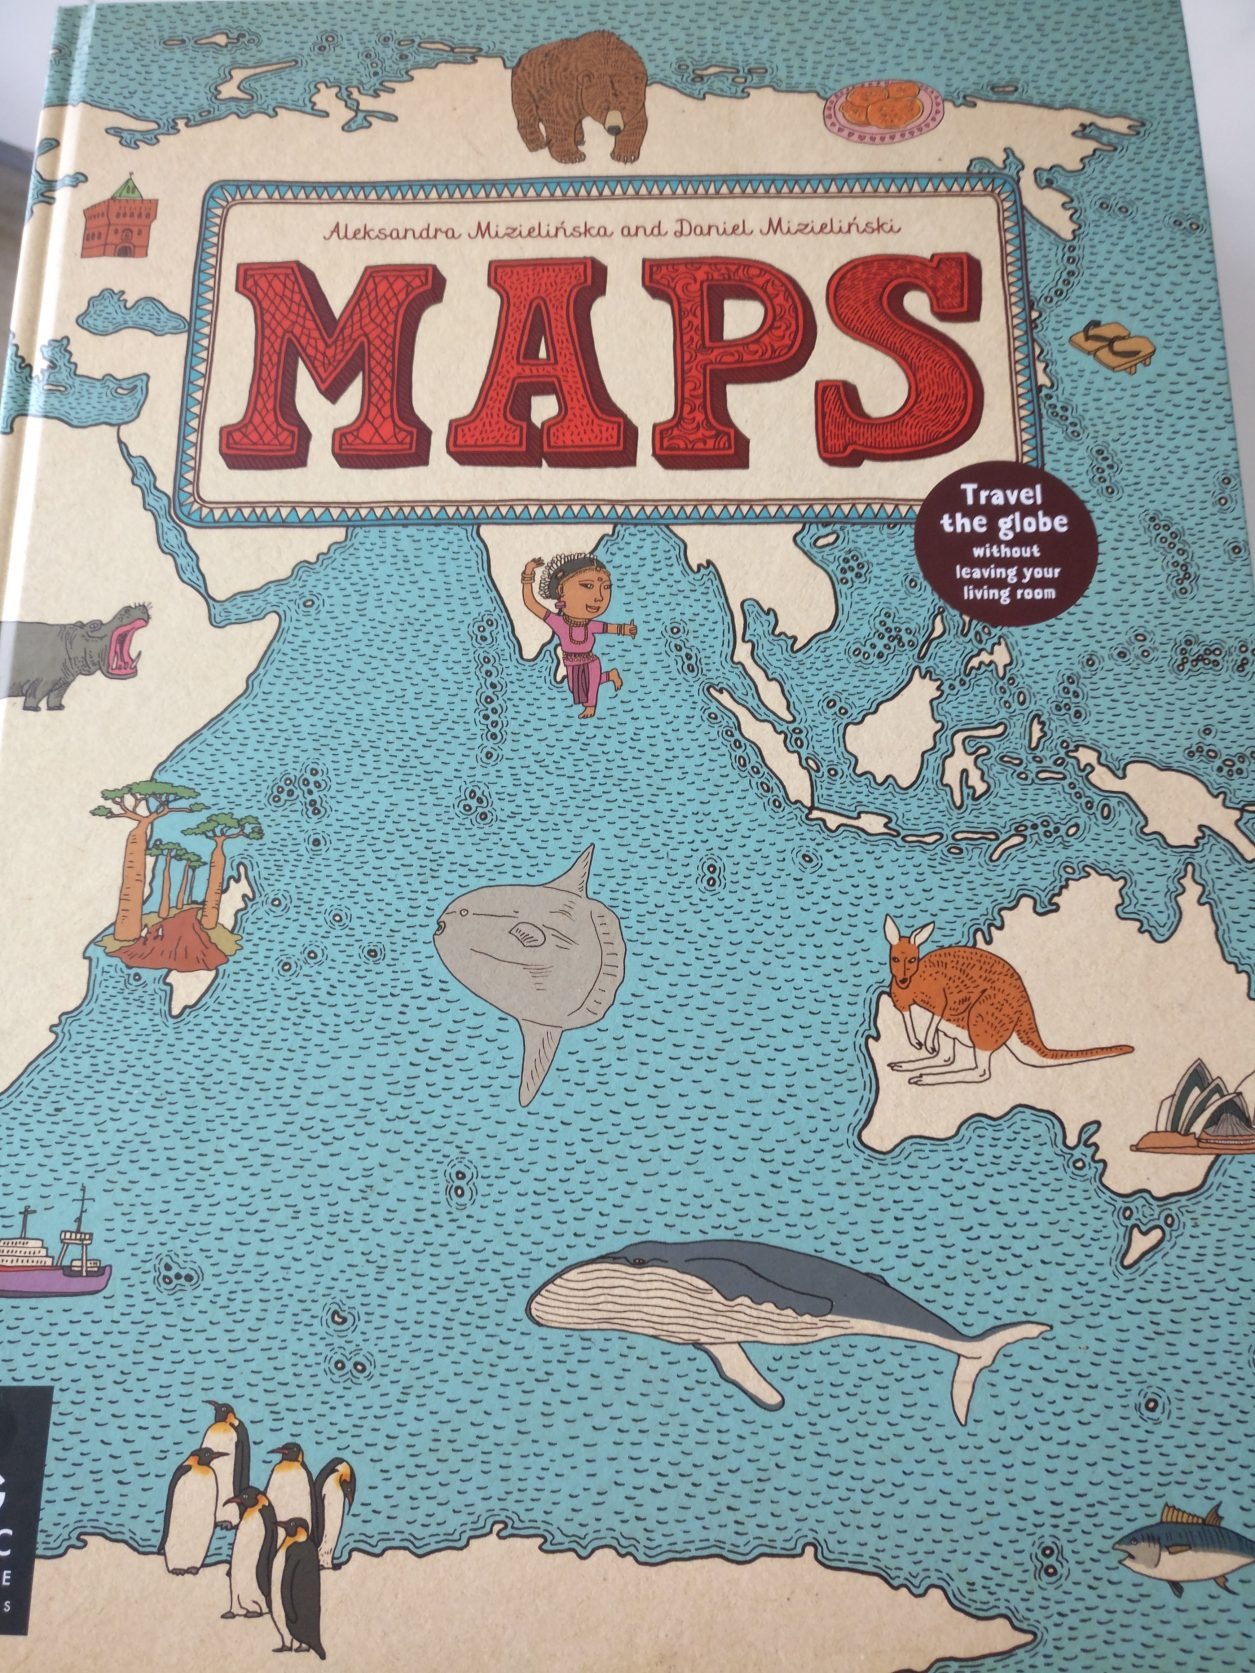 Madres Desterradas Libro Infantil Ilustración Maps Mapas